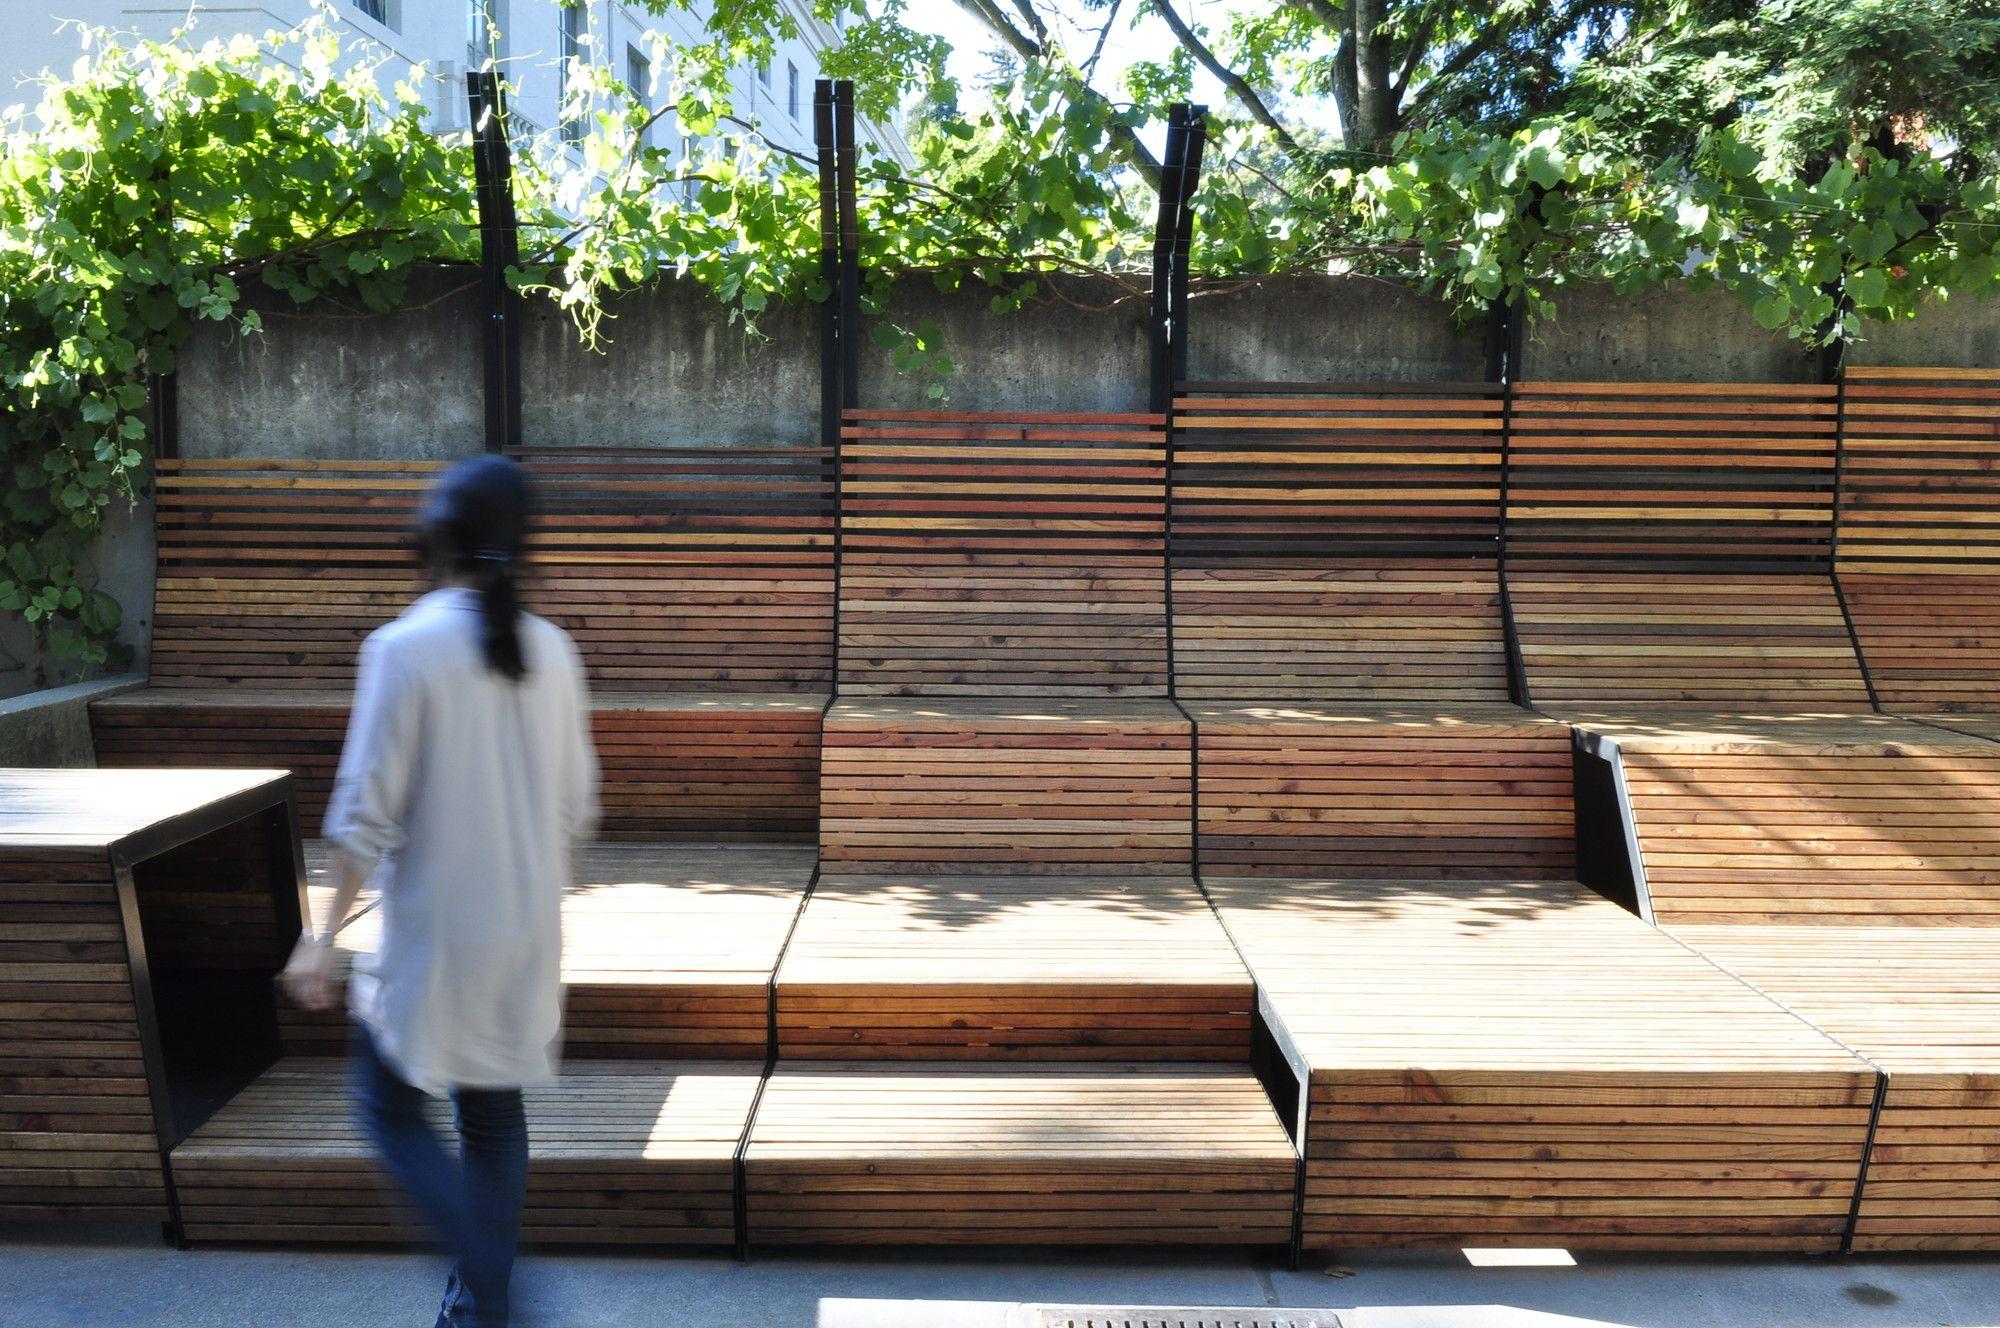 Wurstershire Sauce / UC Berkeley Landscape And Architecture Graduate  Student Team